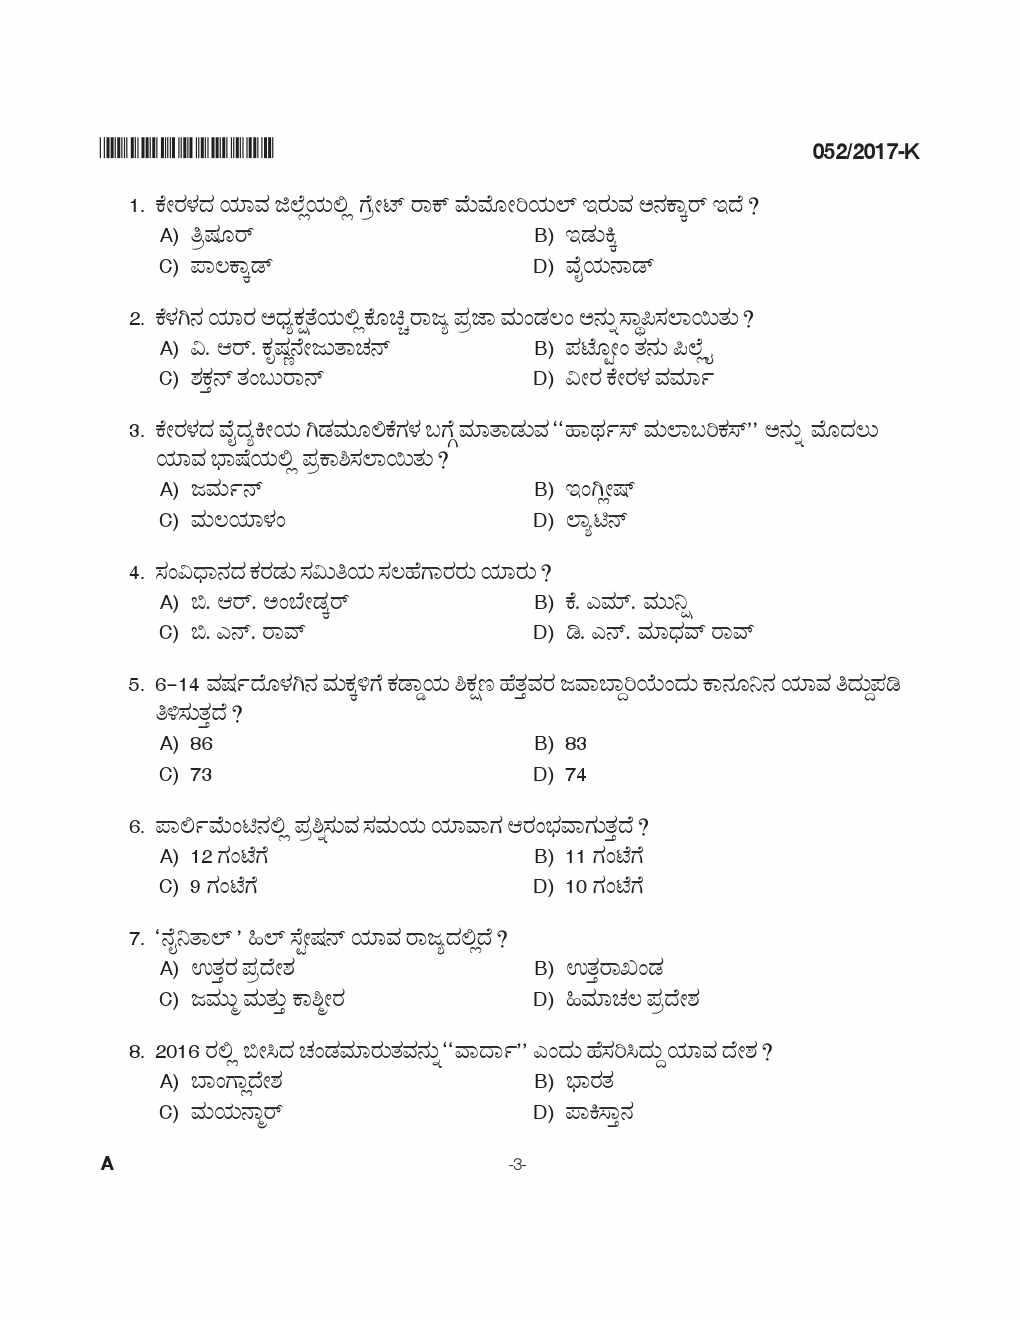 http://masterstudy.net//pdf/psc/women-police-constable-apb-police-question-paper-kannada/q_0522017-k0003.jpg